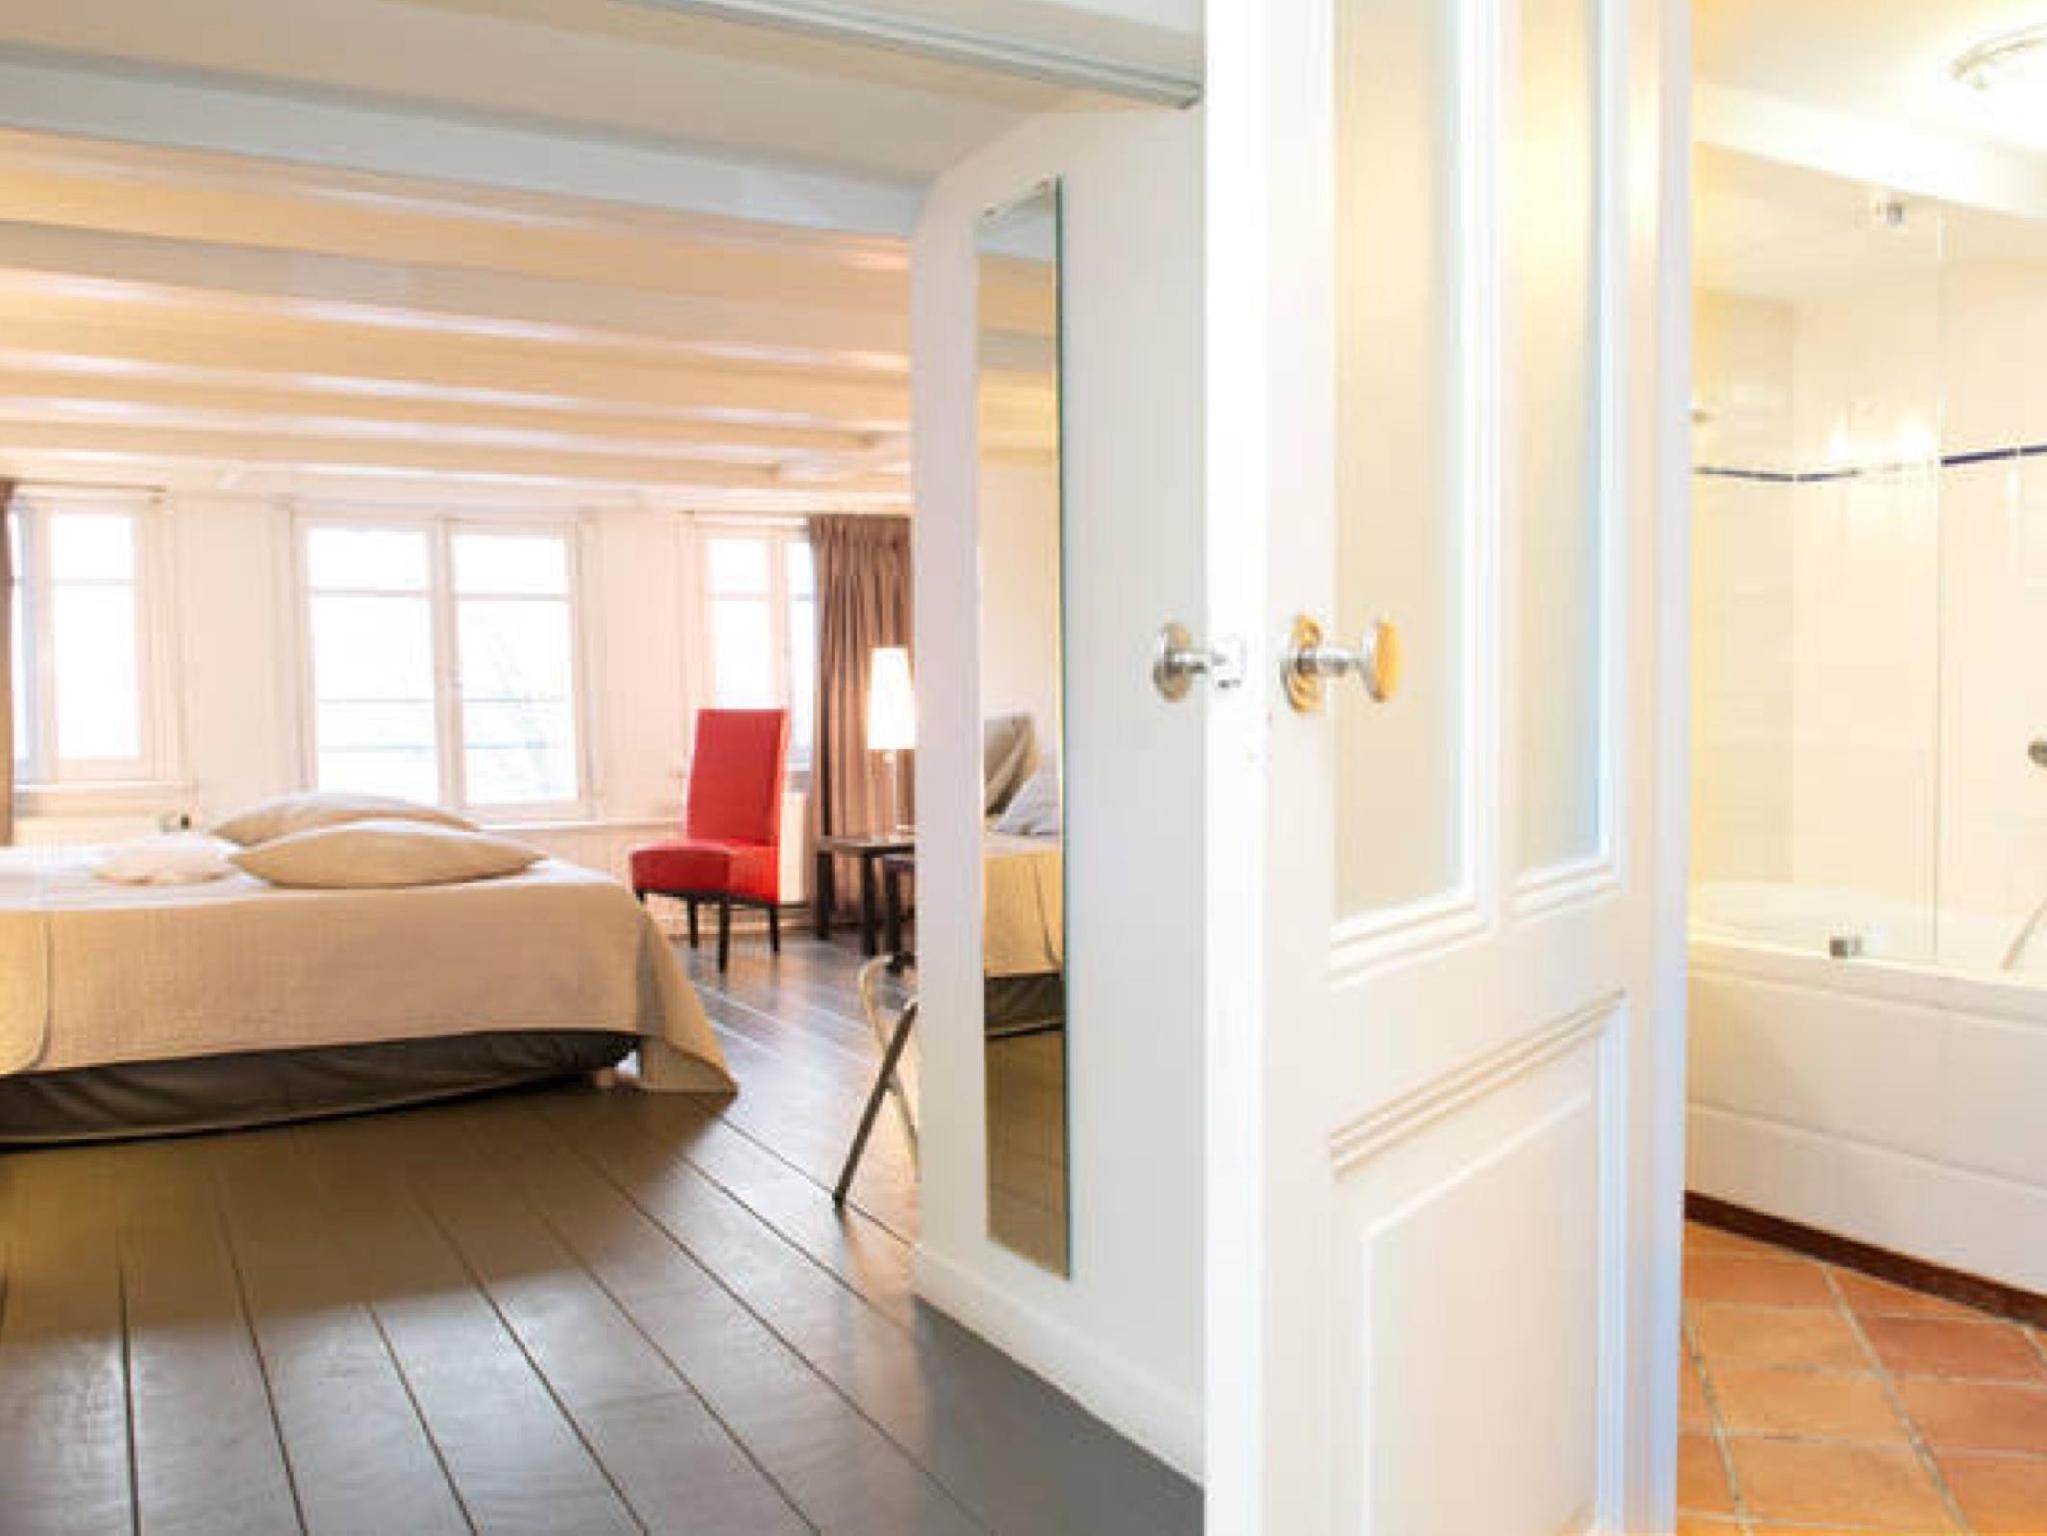 Luxury Keizersgracht Apartments - Amsterdam